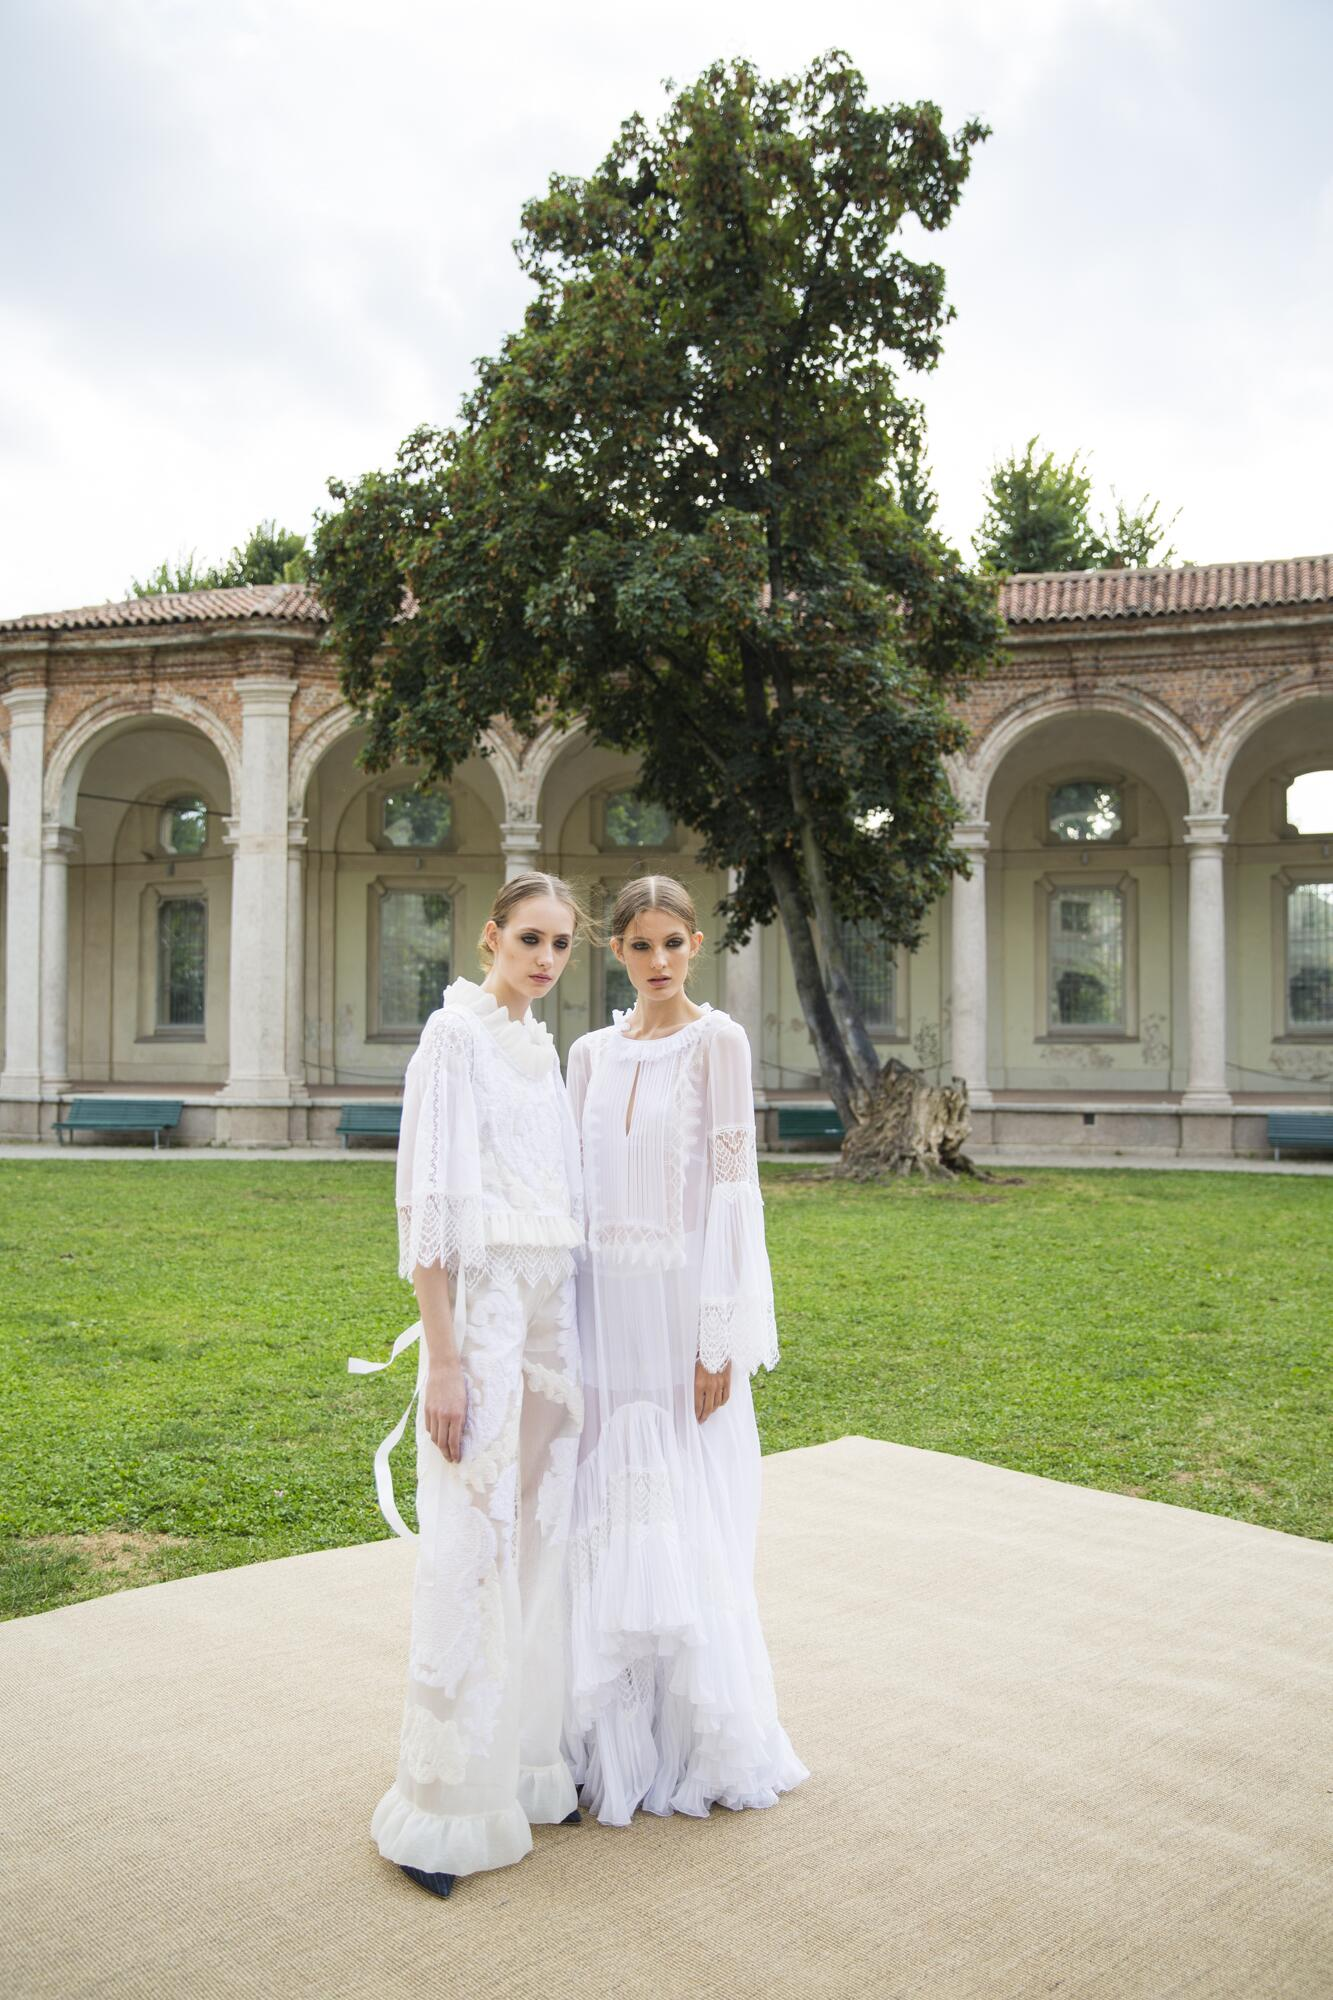 Backstage Alberta Ferretti Fashion Show Models Milan